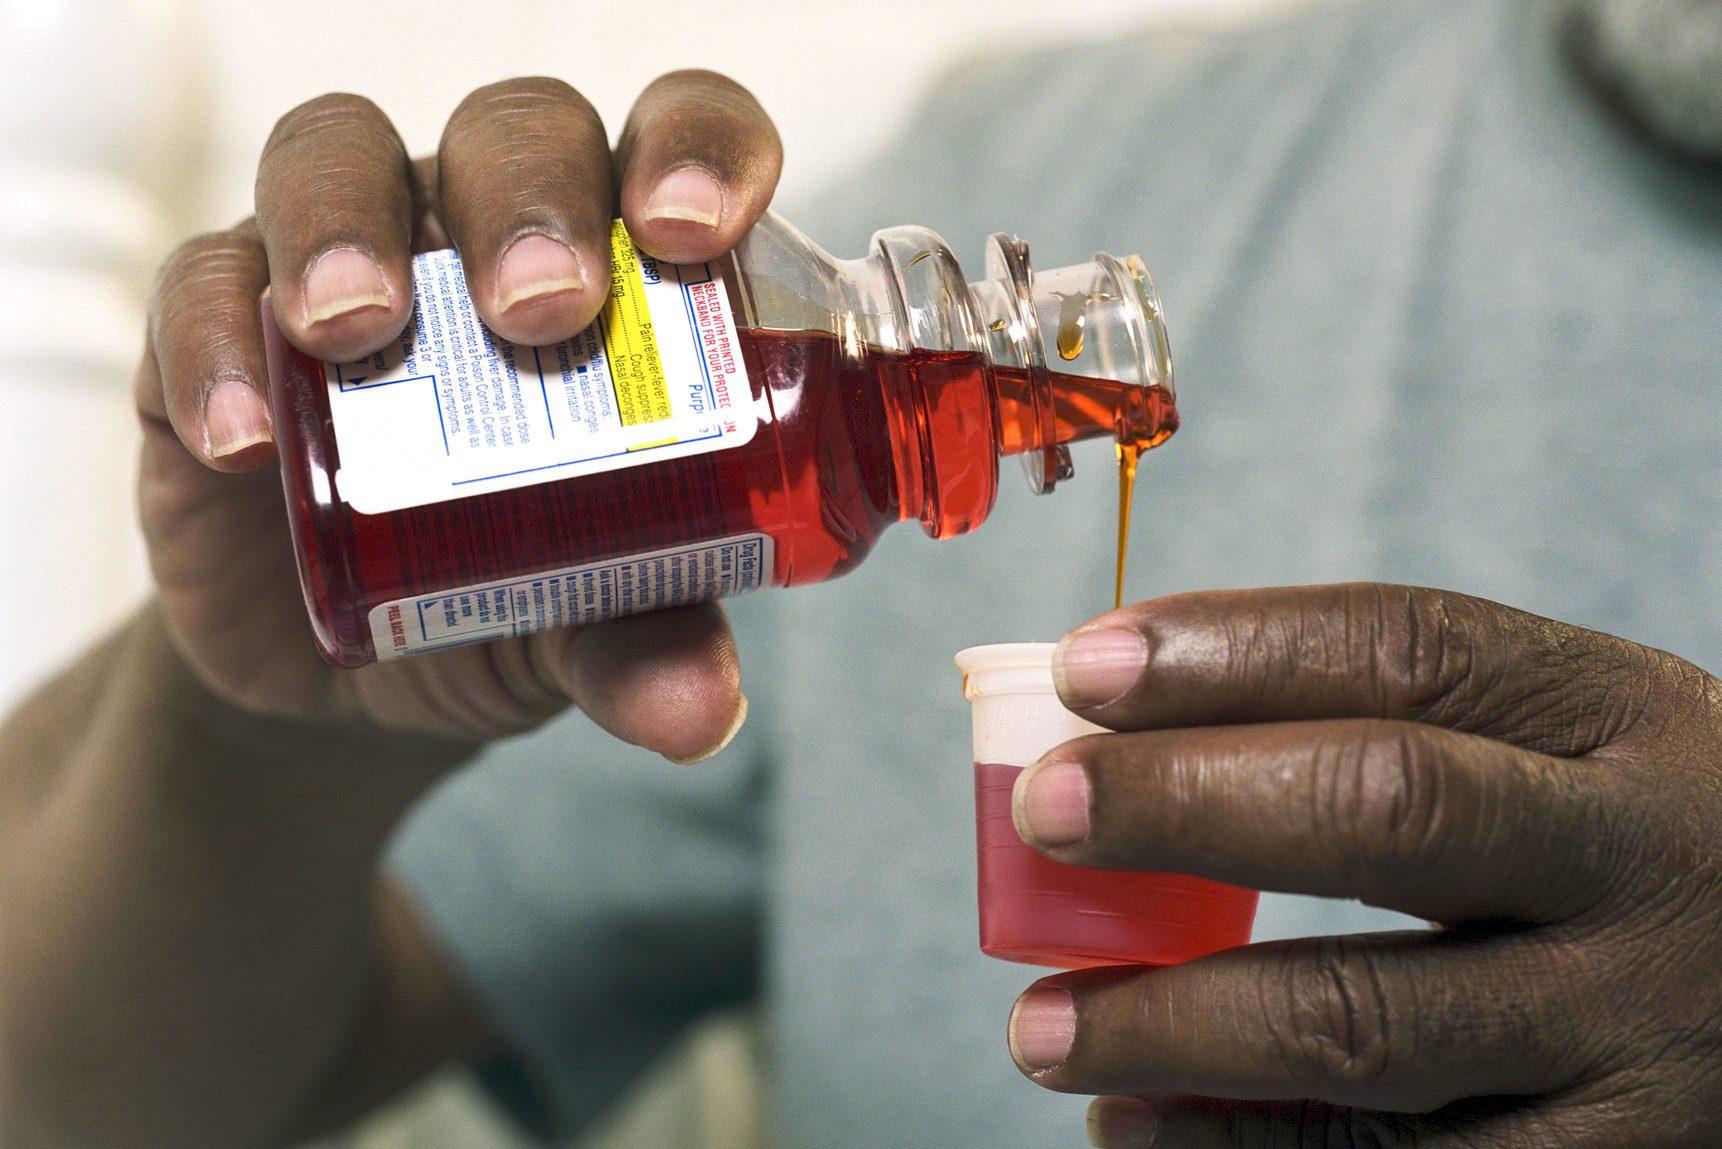 Senior man pouring medicine out of bottle, close-up